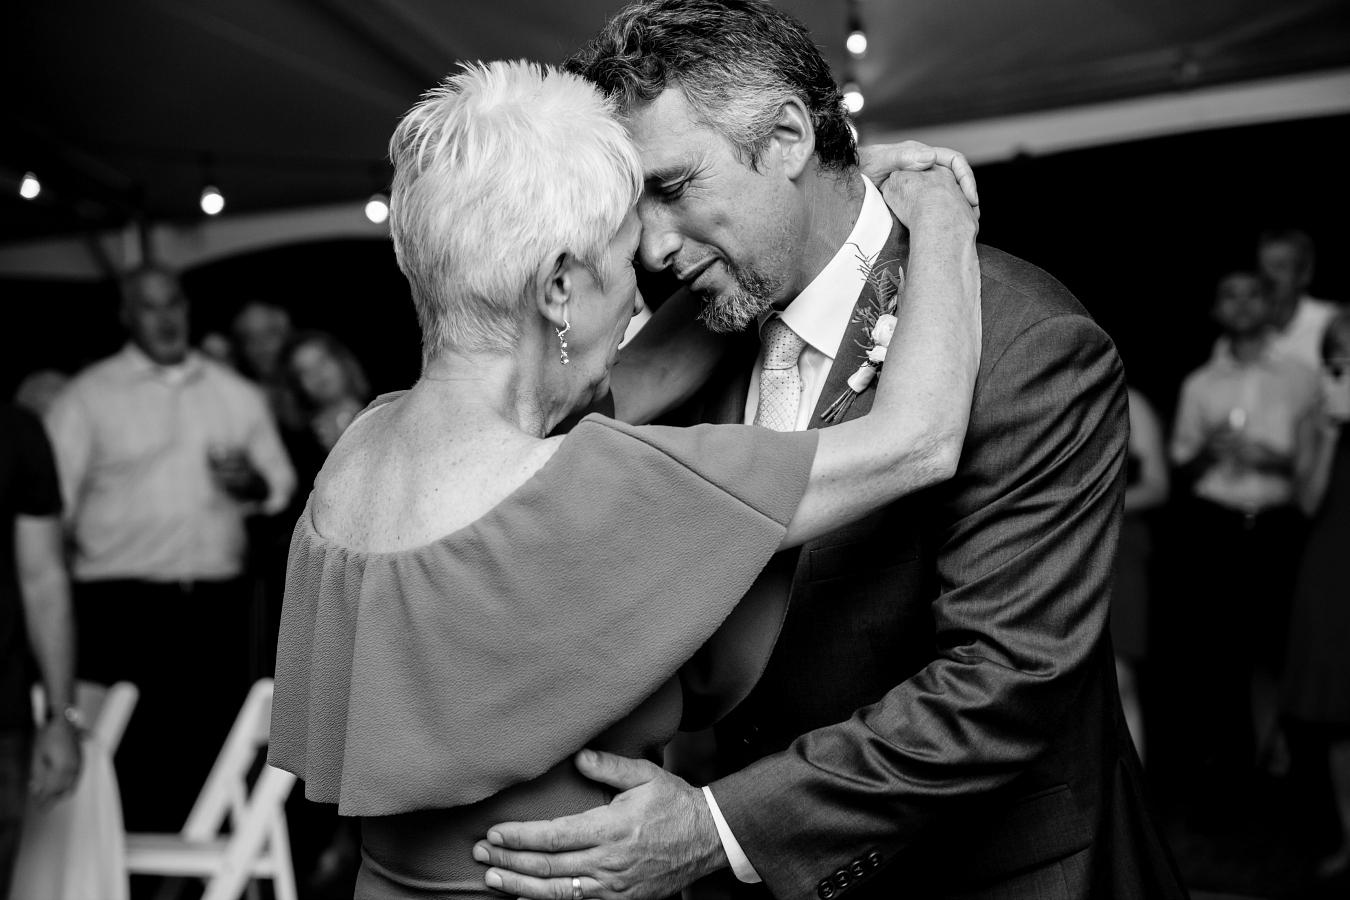 Mother and Son Wedding Dance Photos